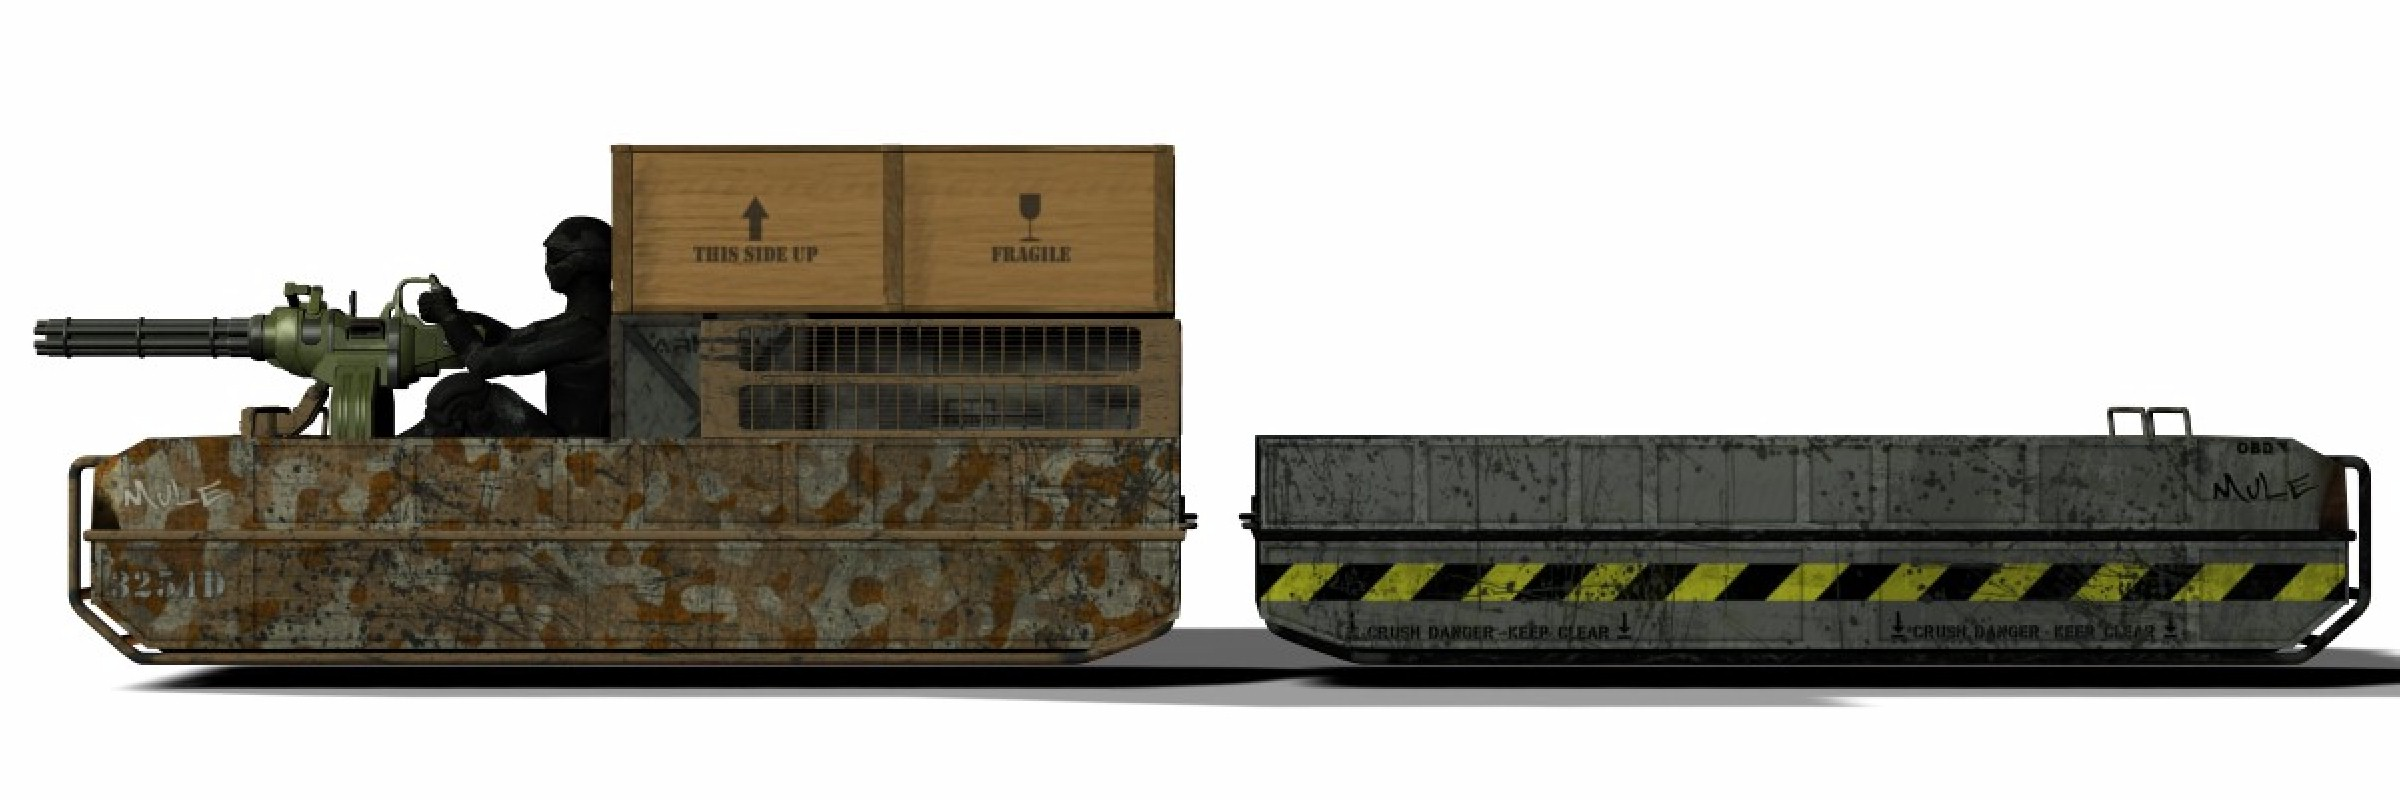 A-Train_Base_05_03_WS_large.jpg